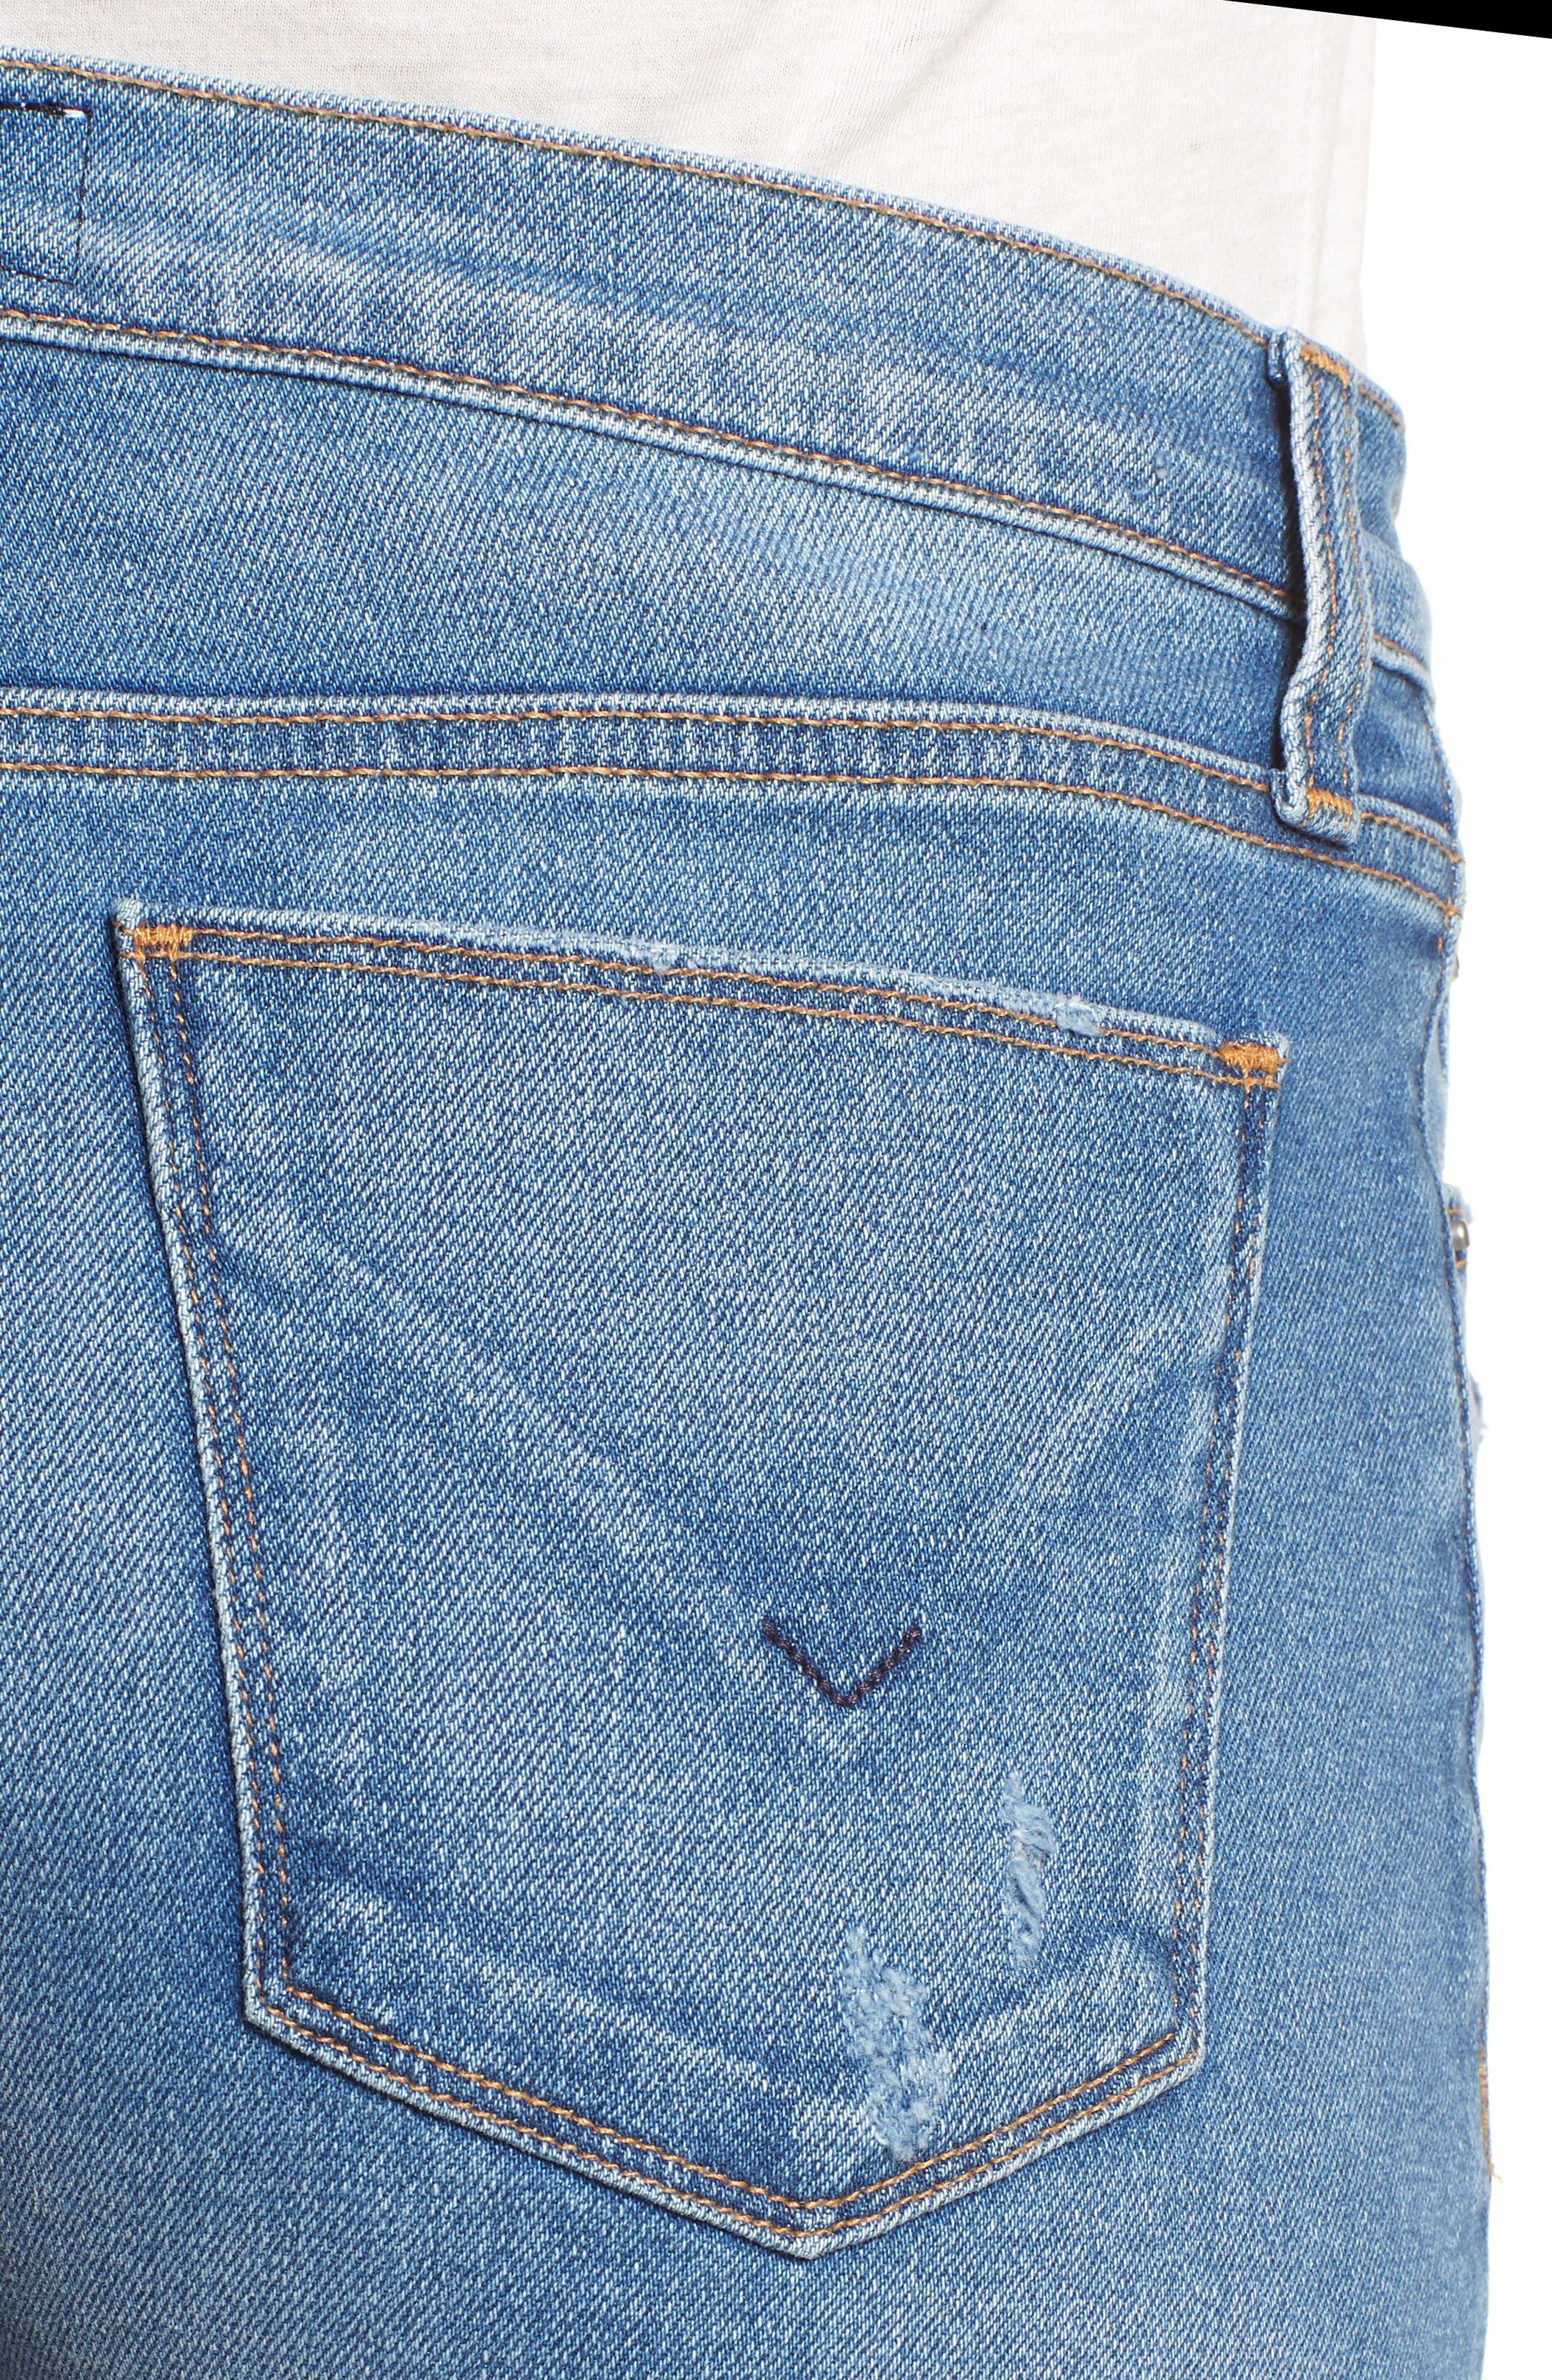 Valeri Cuff Denim Shorts,                             Alternate thumbnail 4, color,                             Proxy